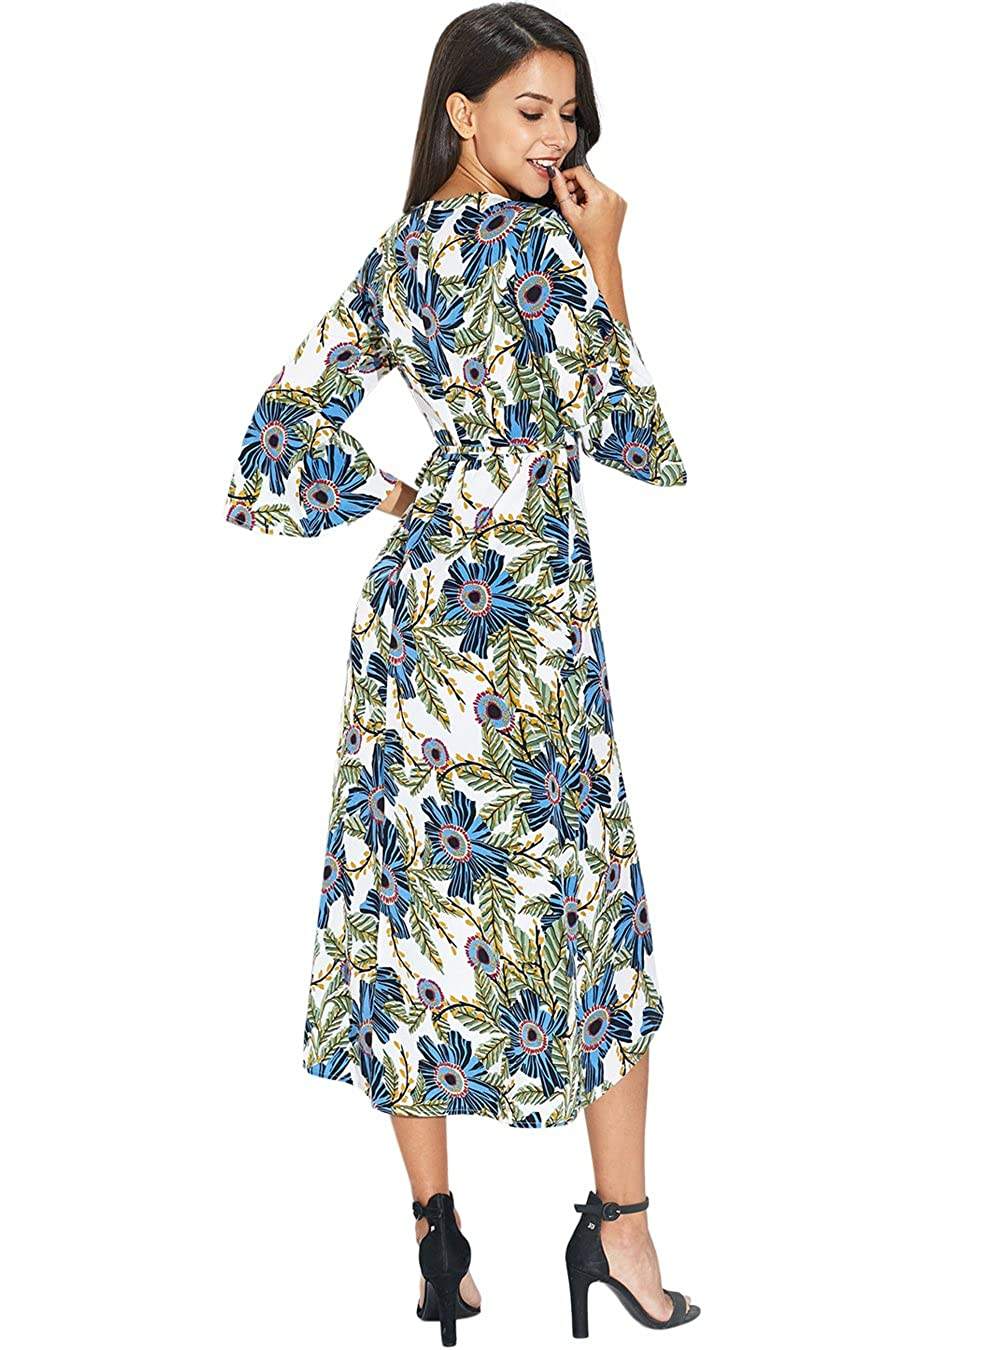 fc2b76912100 PYL Women's Flare Sleeve V Neck Floral Wrap Midi Dress at Amazon Women's  Clothing store: